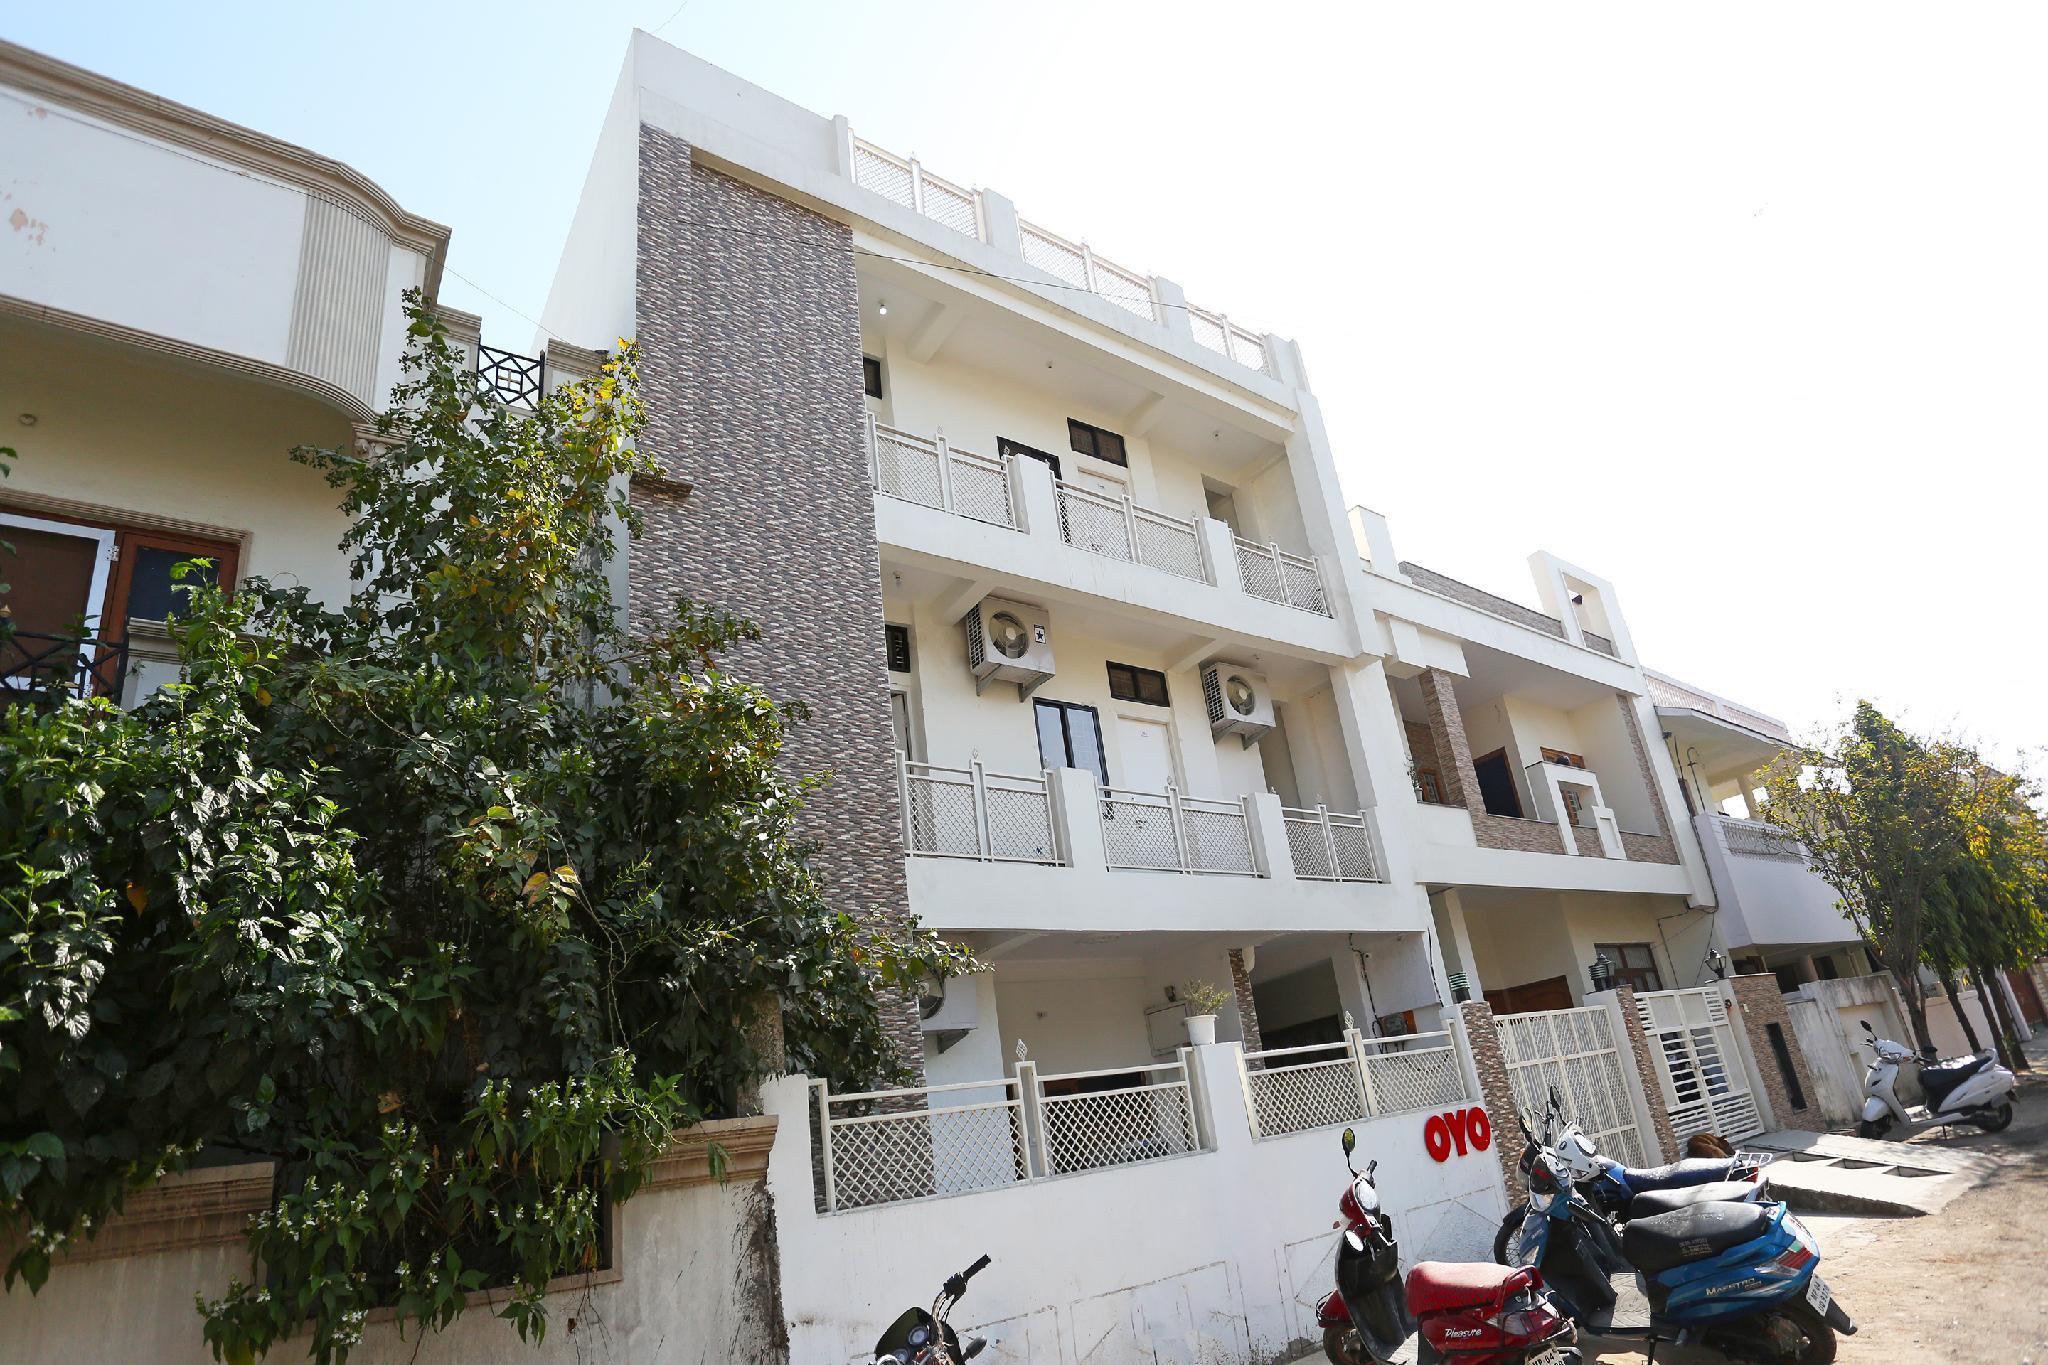 OYO 30359 Vinayak Hospitality Services